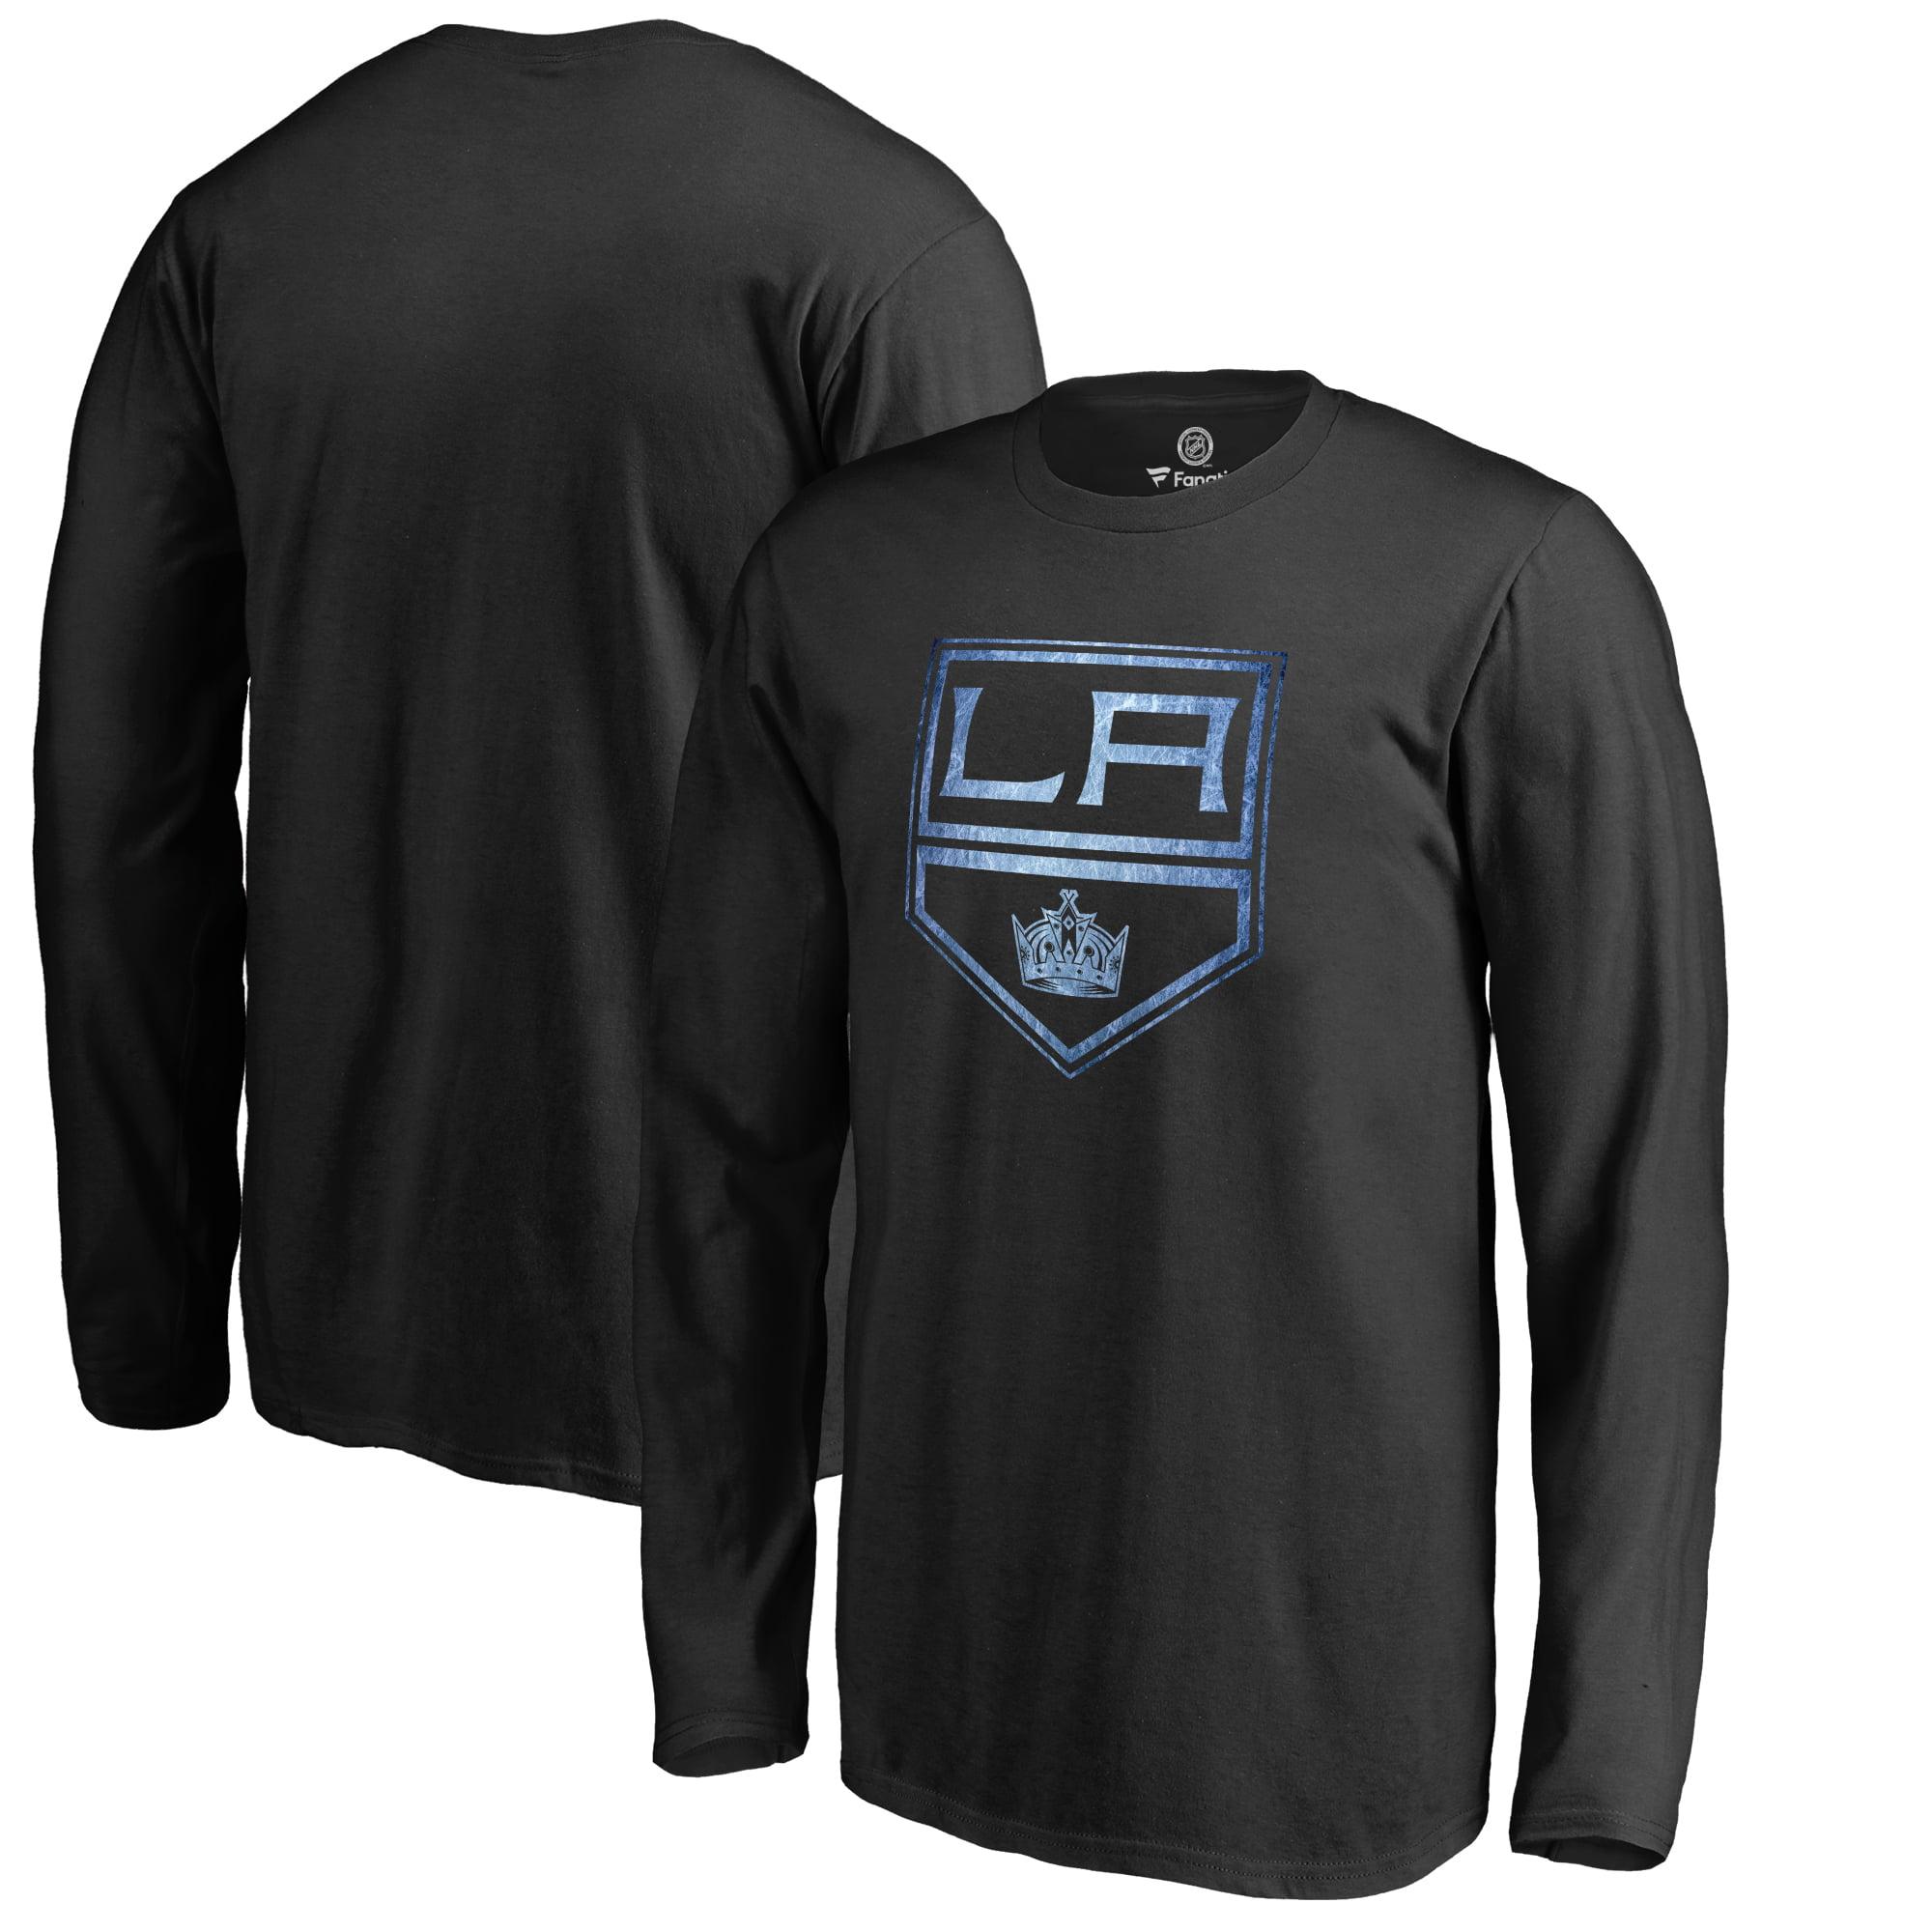 Los Angeles Kings Youth Pond Hockey Long Sleeve T-Shirt - Black